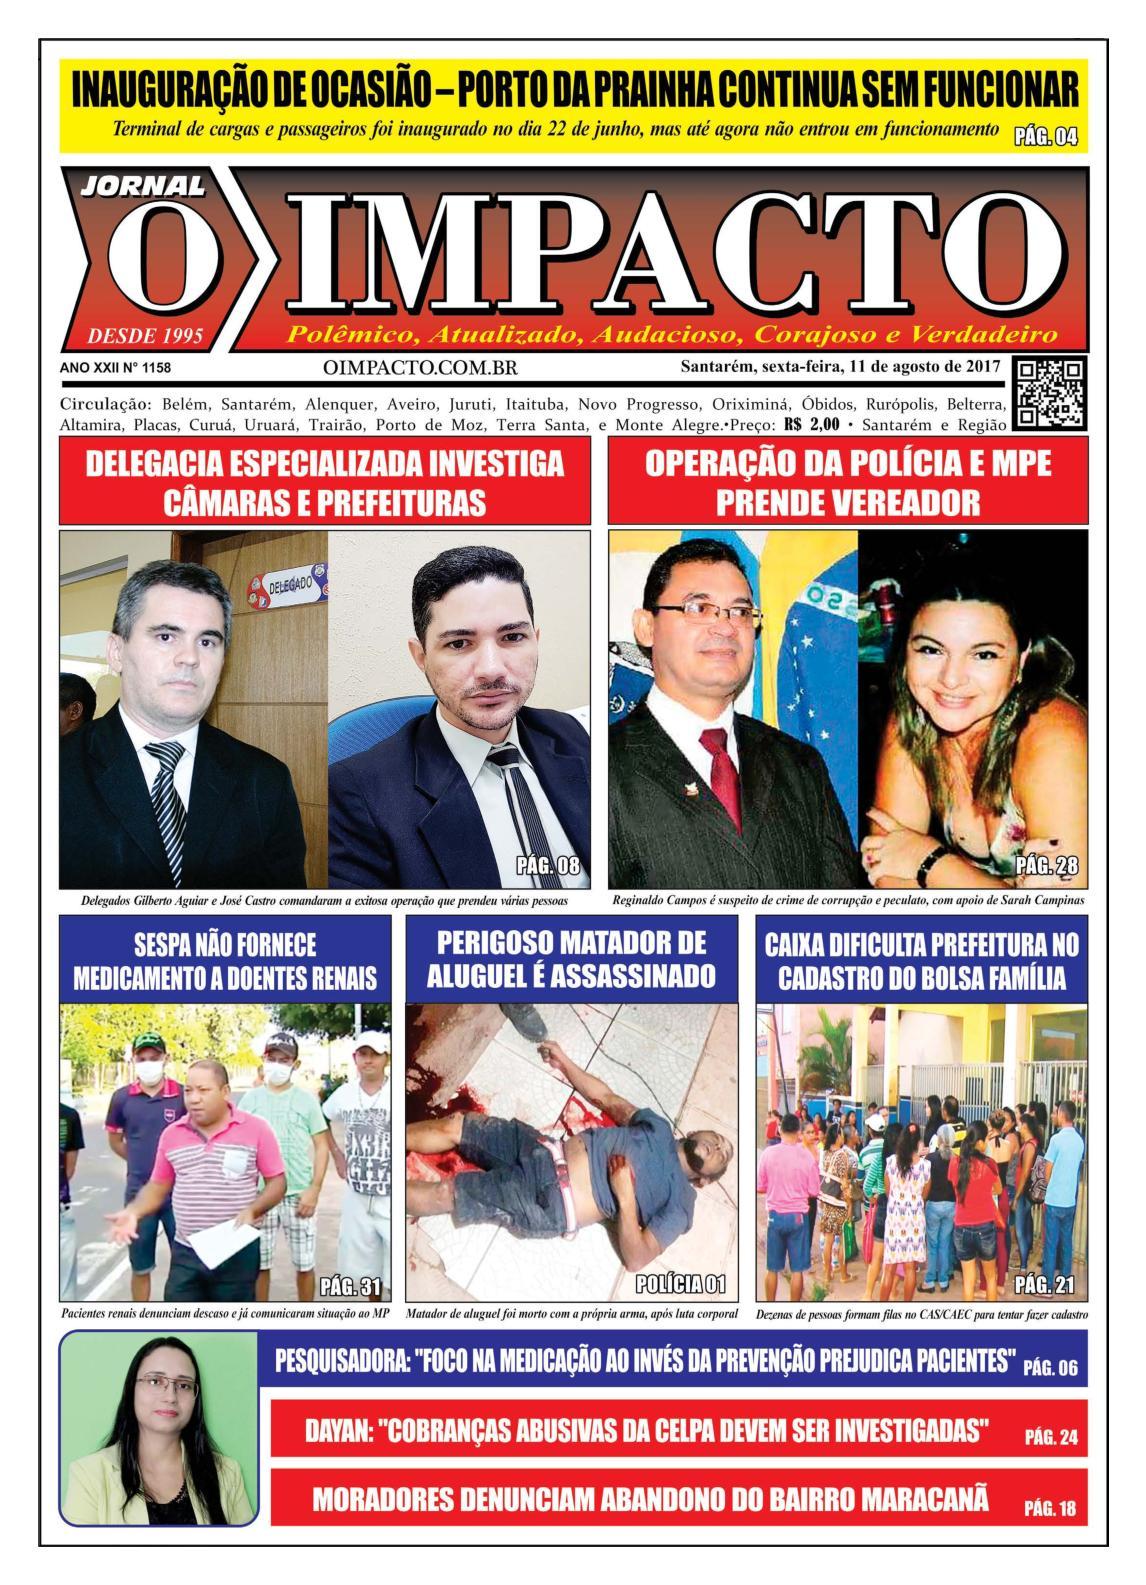 Anelise Pelada calaméo - jornal o impacto ed. 1158